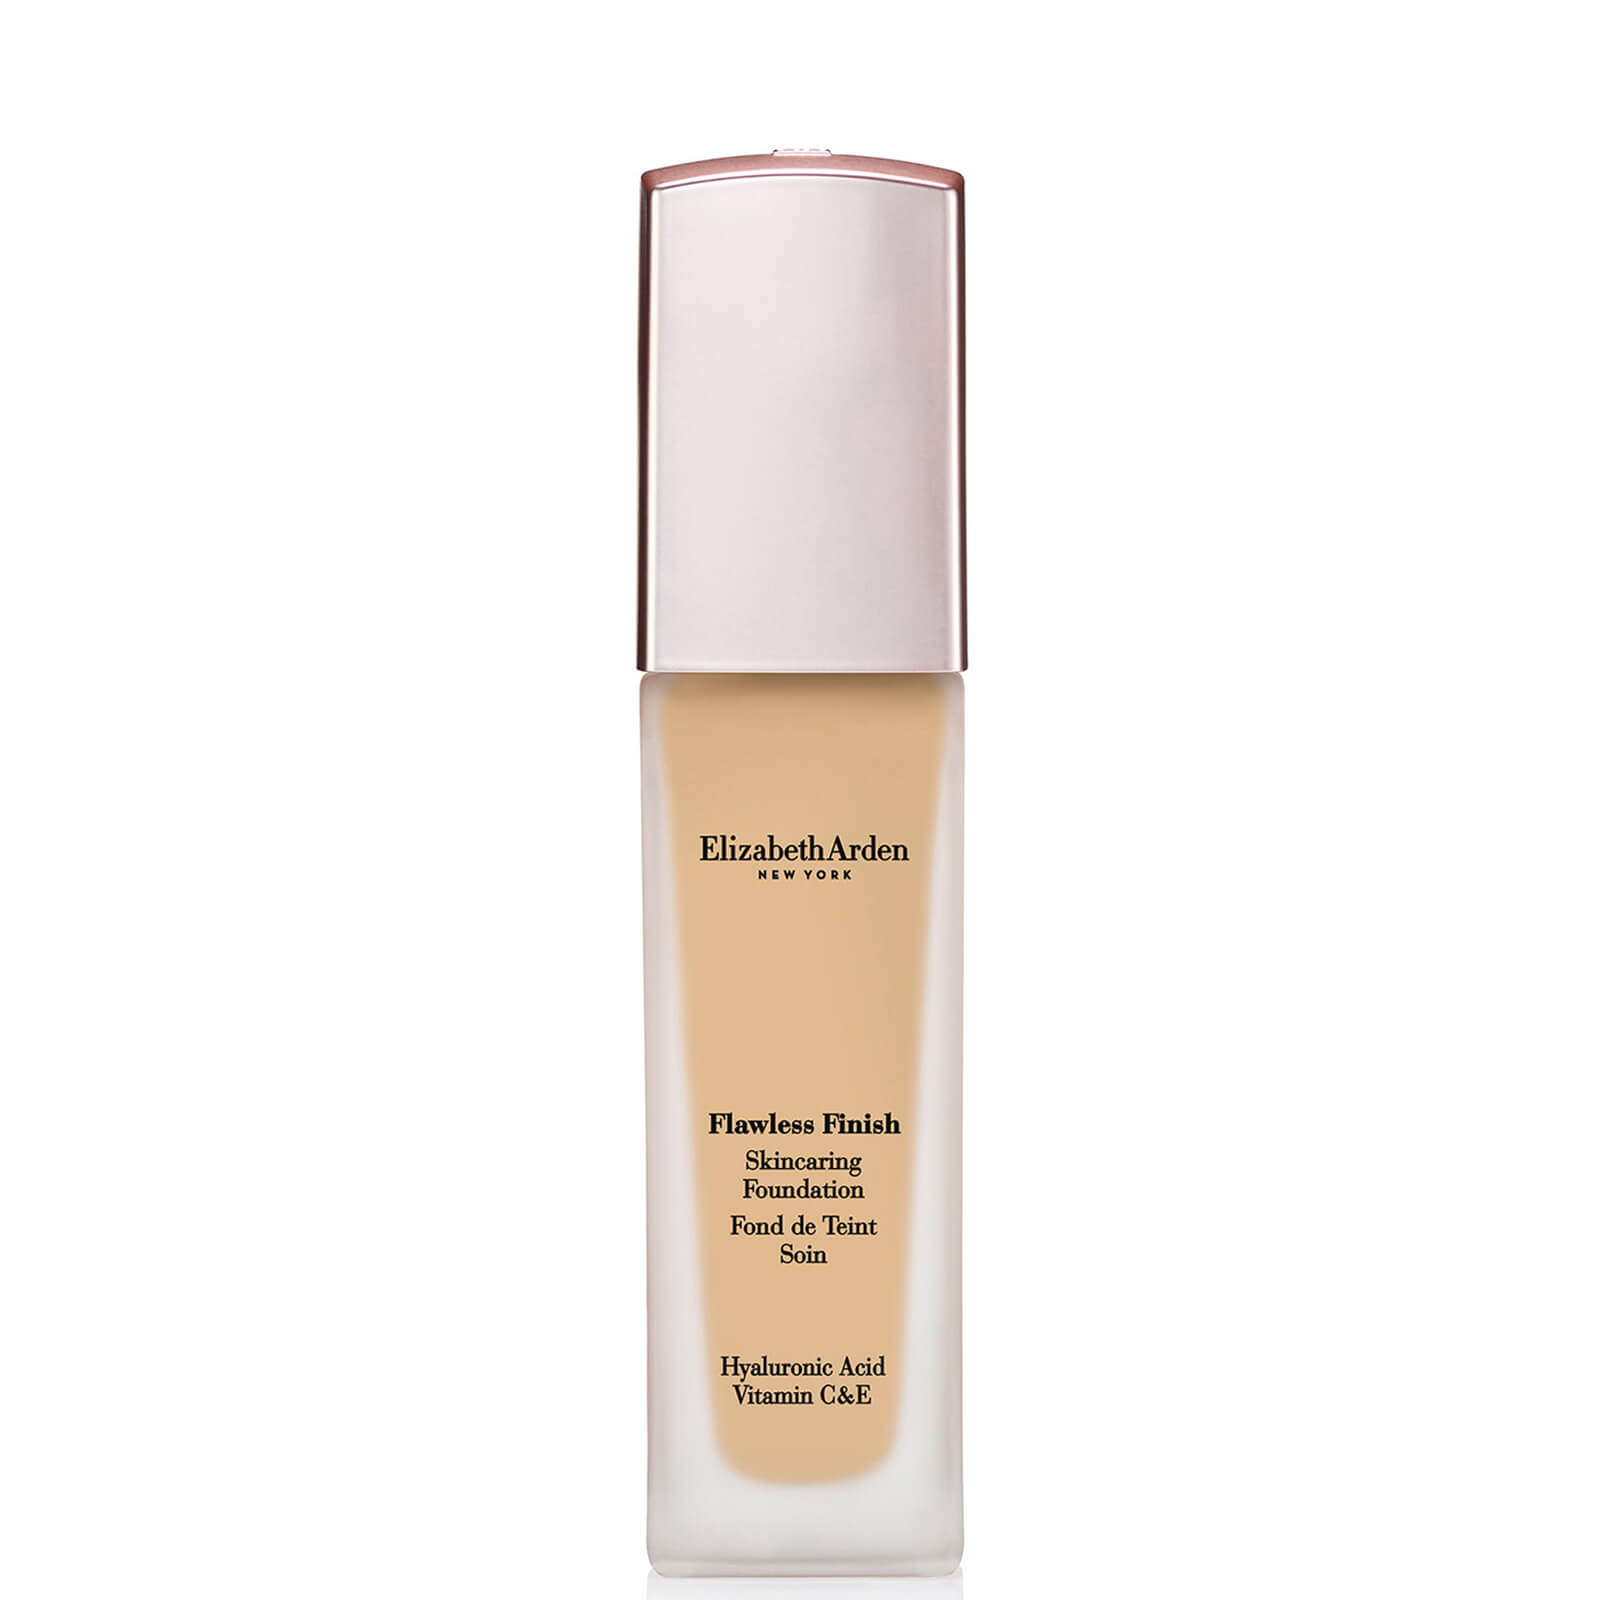 Купить Elizabeth Arden Flawless Finish Skincaring Foundation 30ml (Various Shades) - 250N